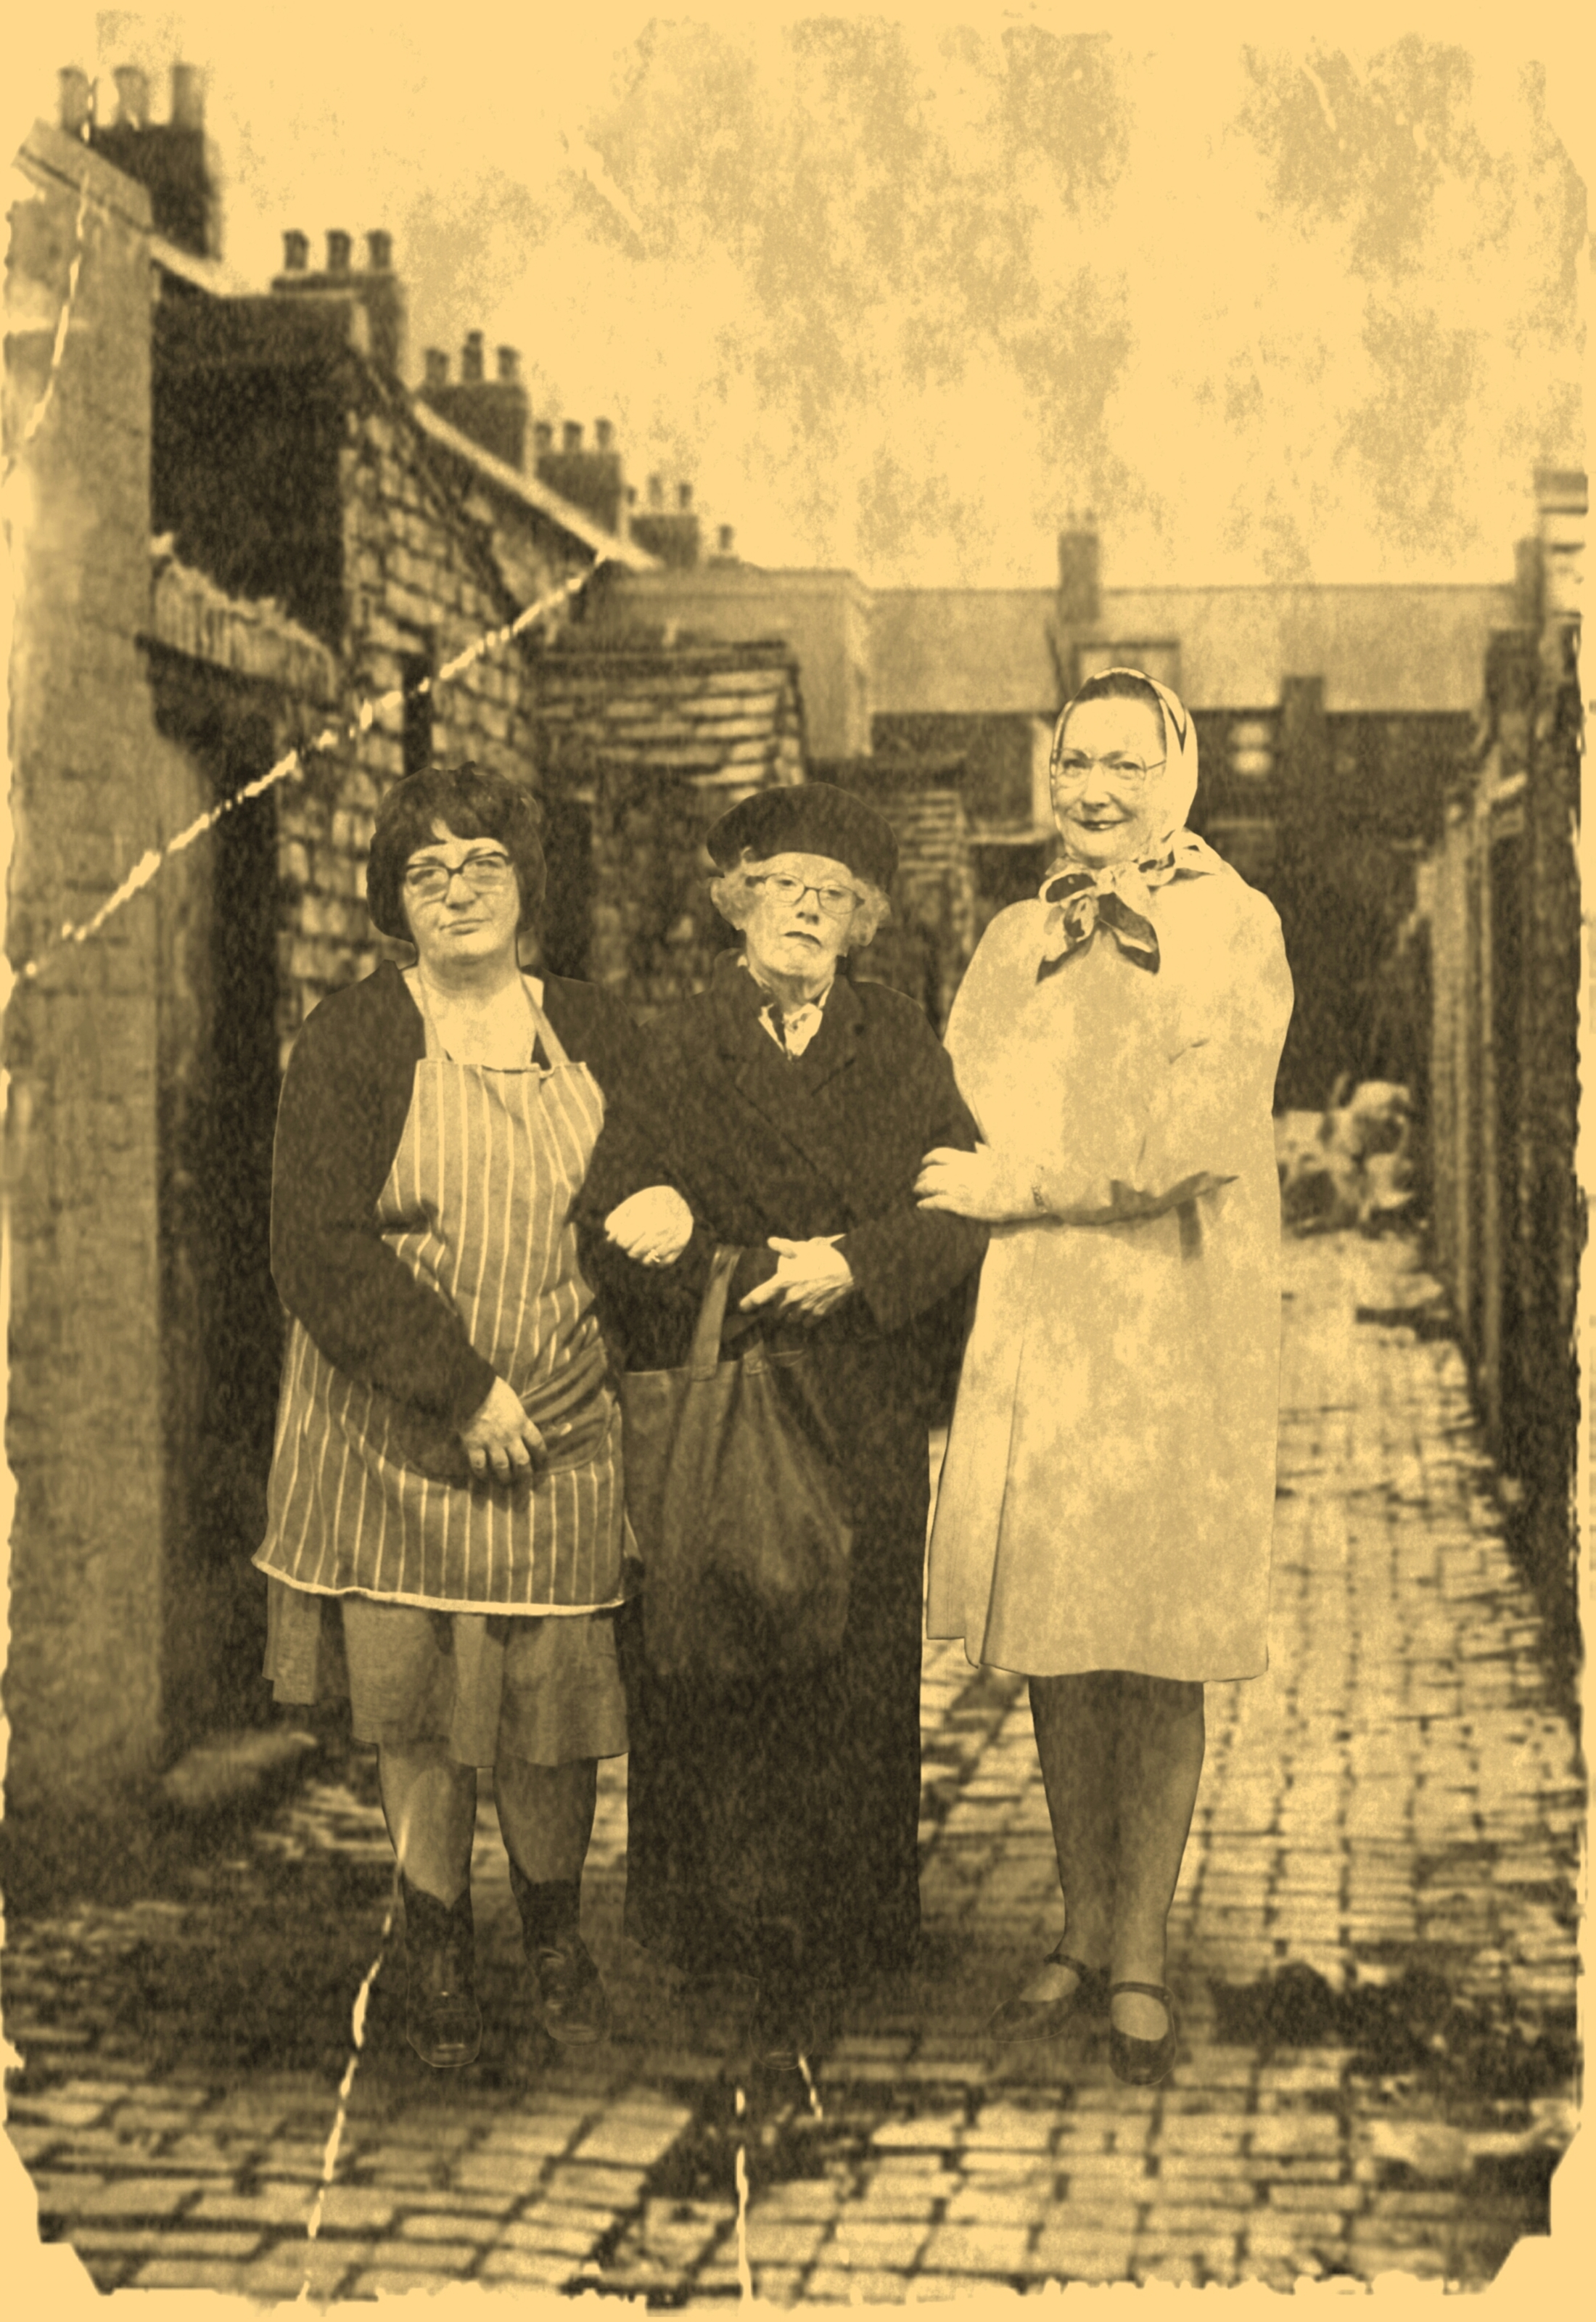 The Salford Belles